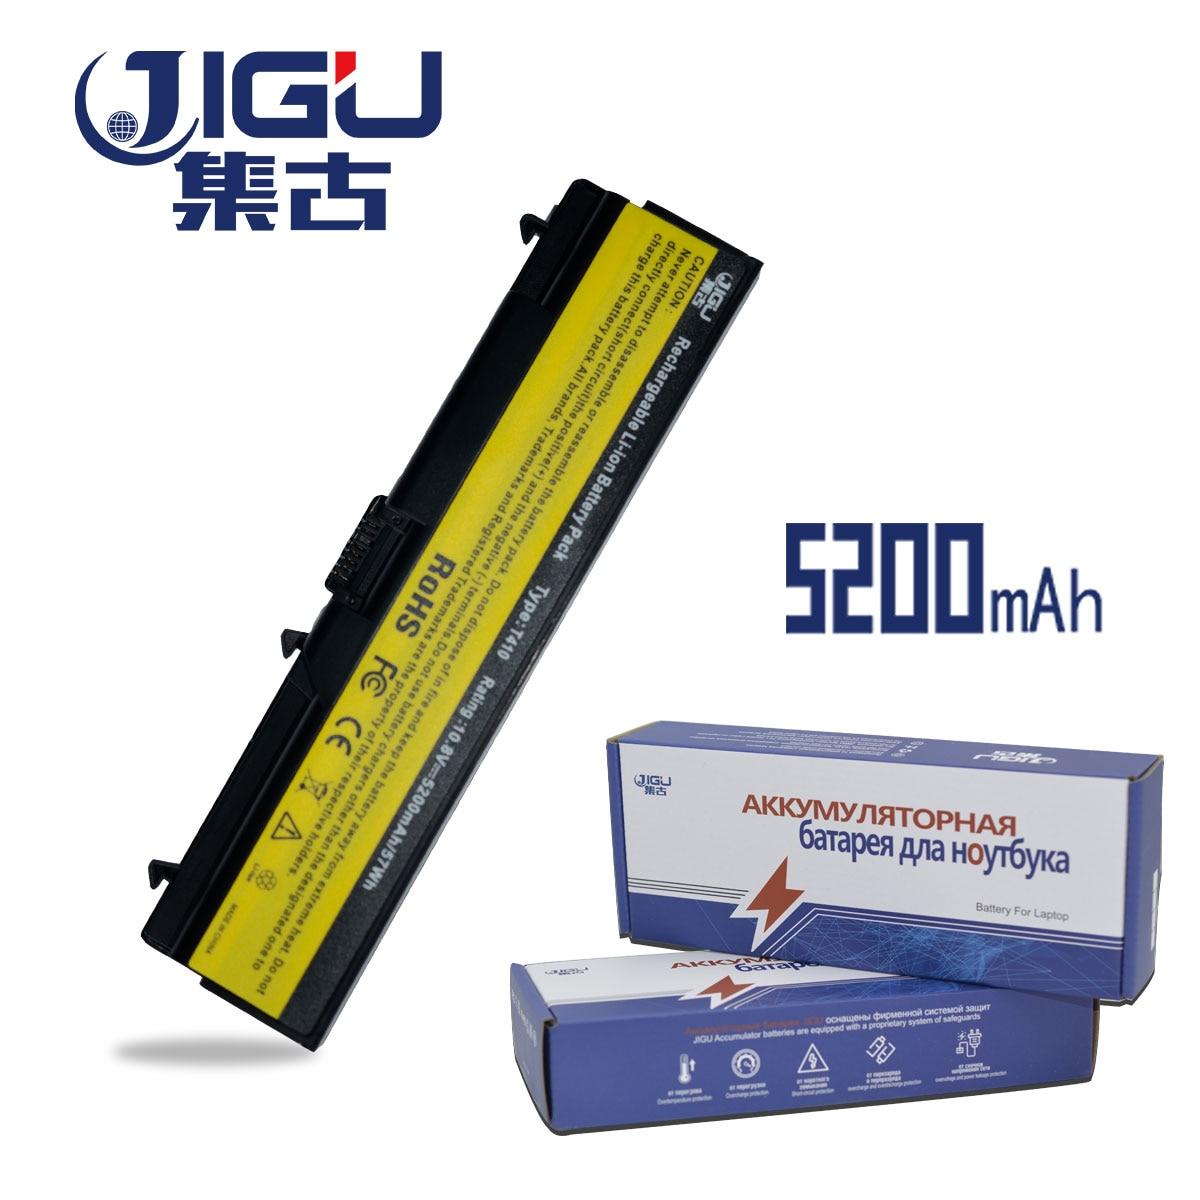 Jigu Batterie Pour Lenovo Thinkpad Edge E40 E50 L410 L412 L420 L421 Keyboard T400s T410 T420 T510 T520 W510 X220 L510 L512 L520 W520